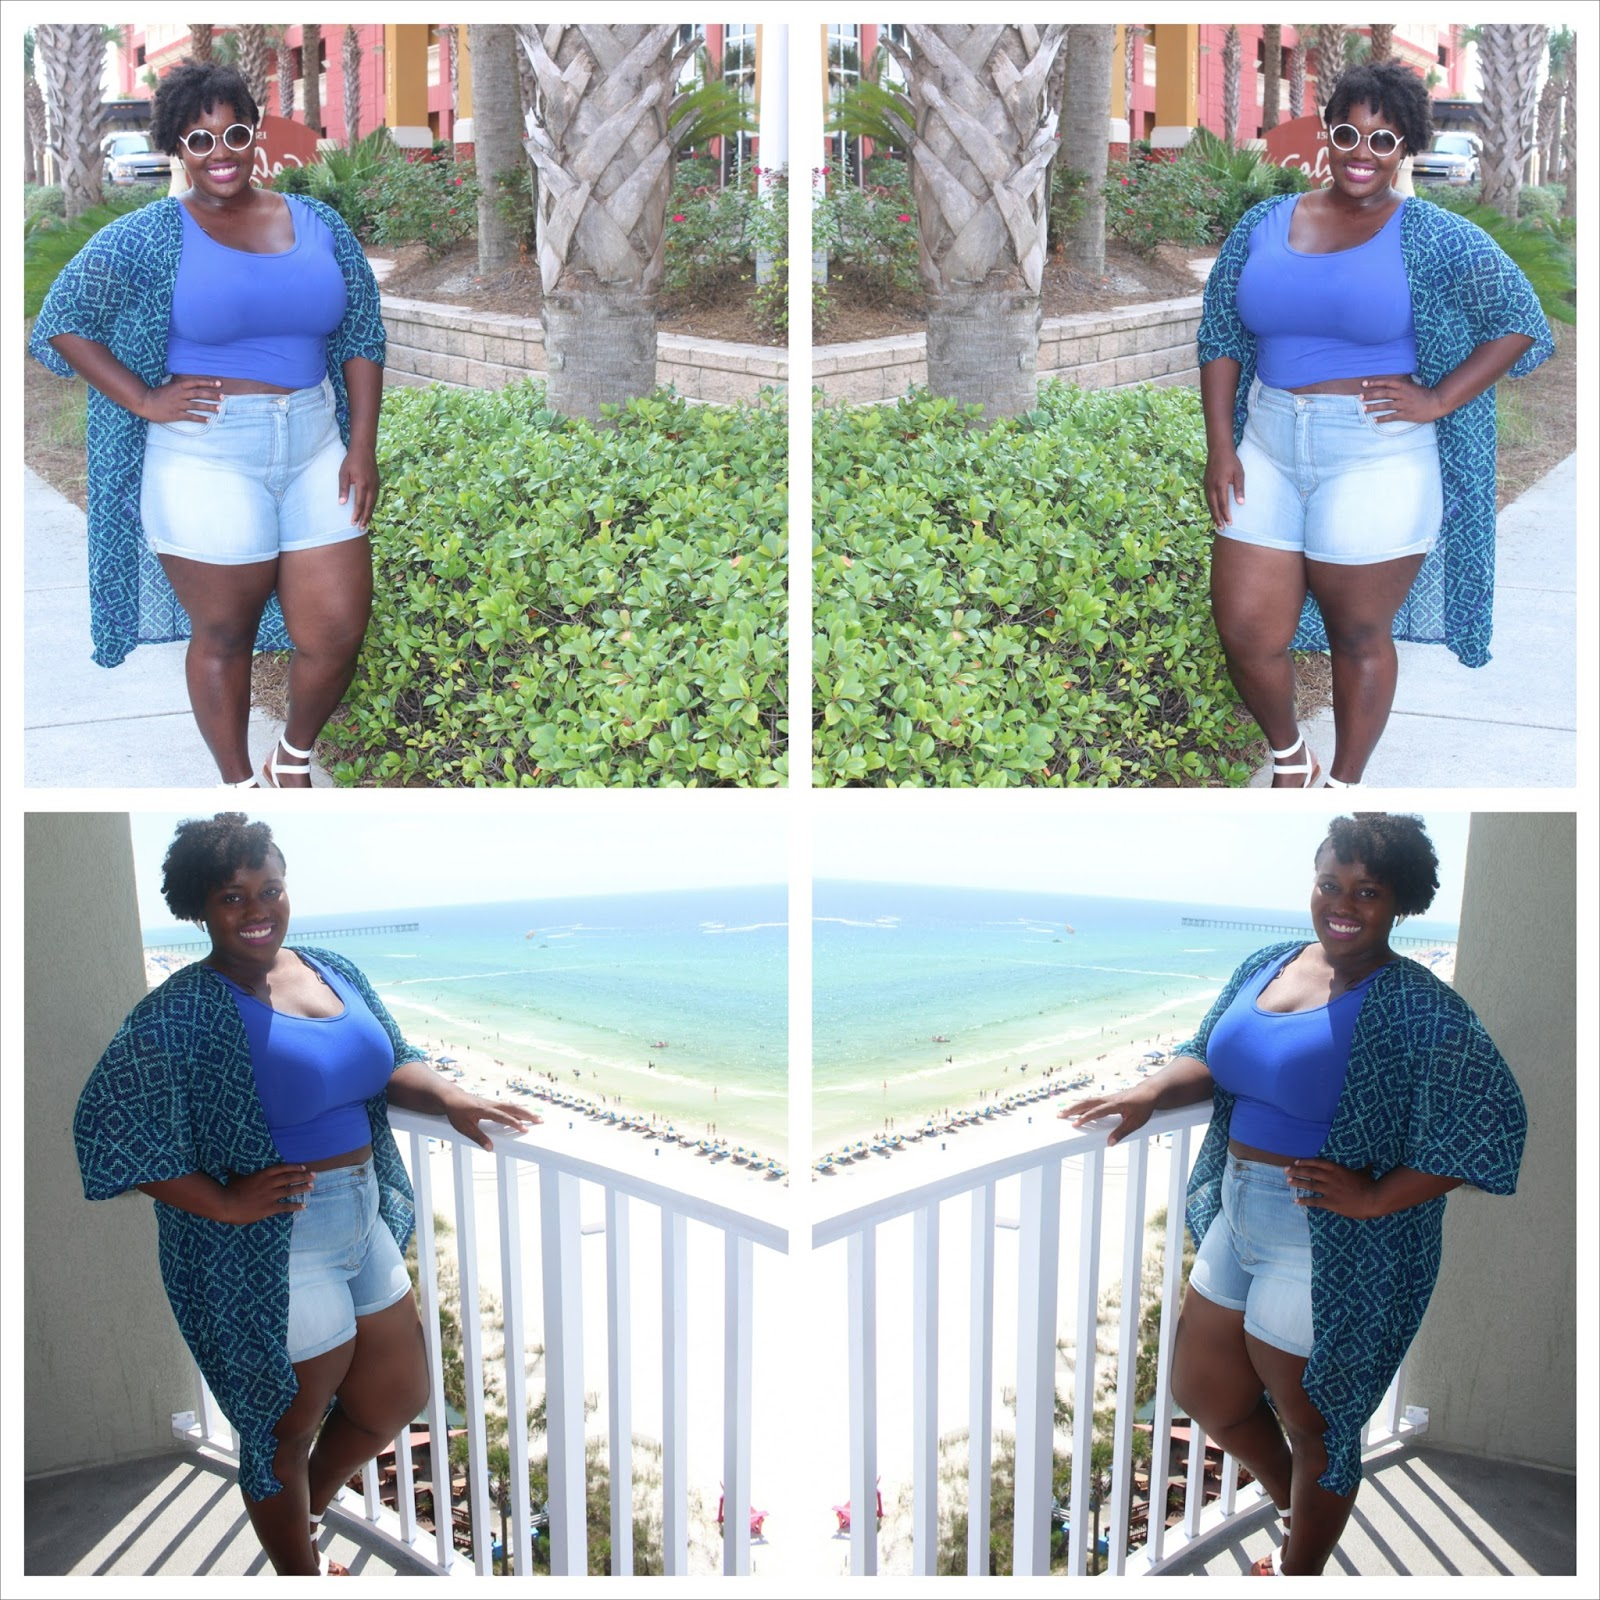 H And M Panama City Beach Panama City Beach  Florida